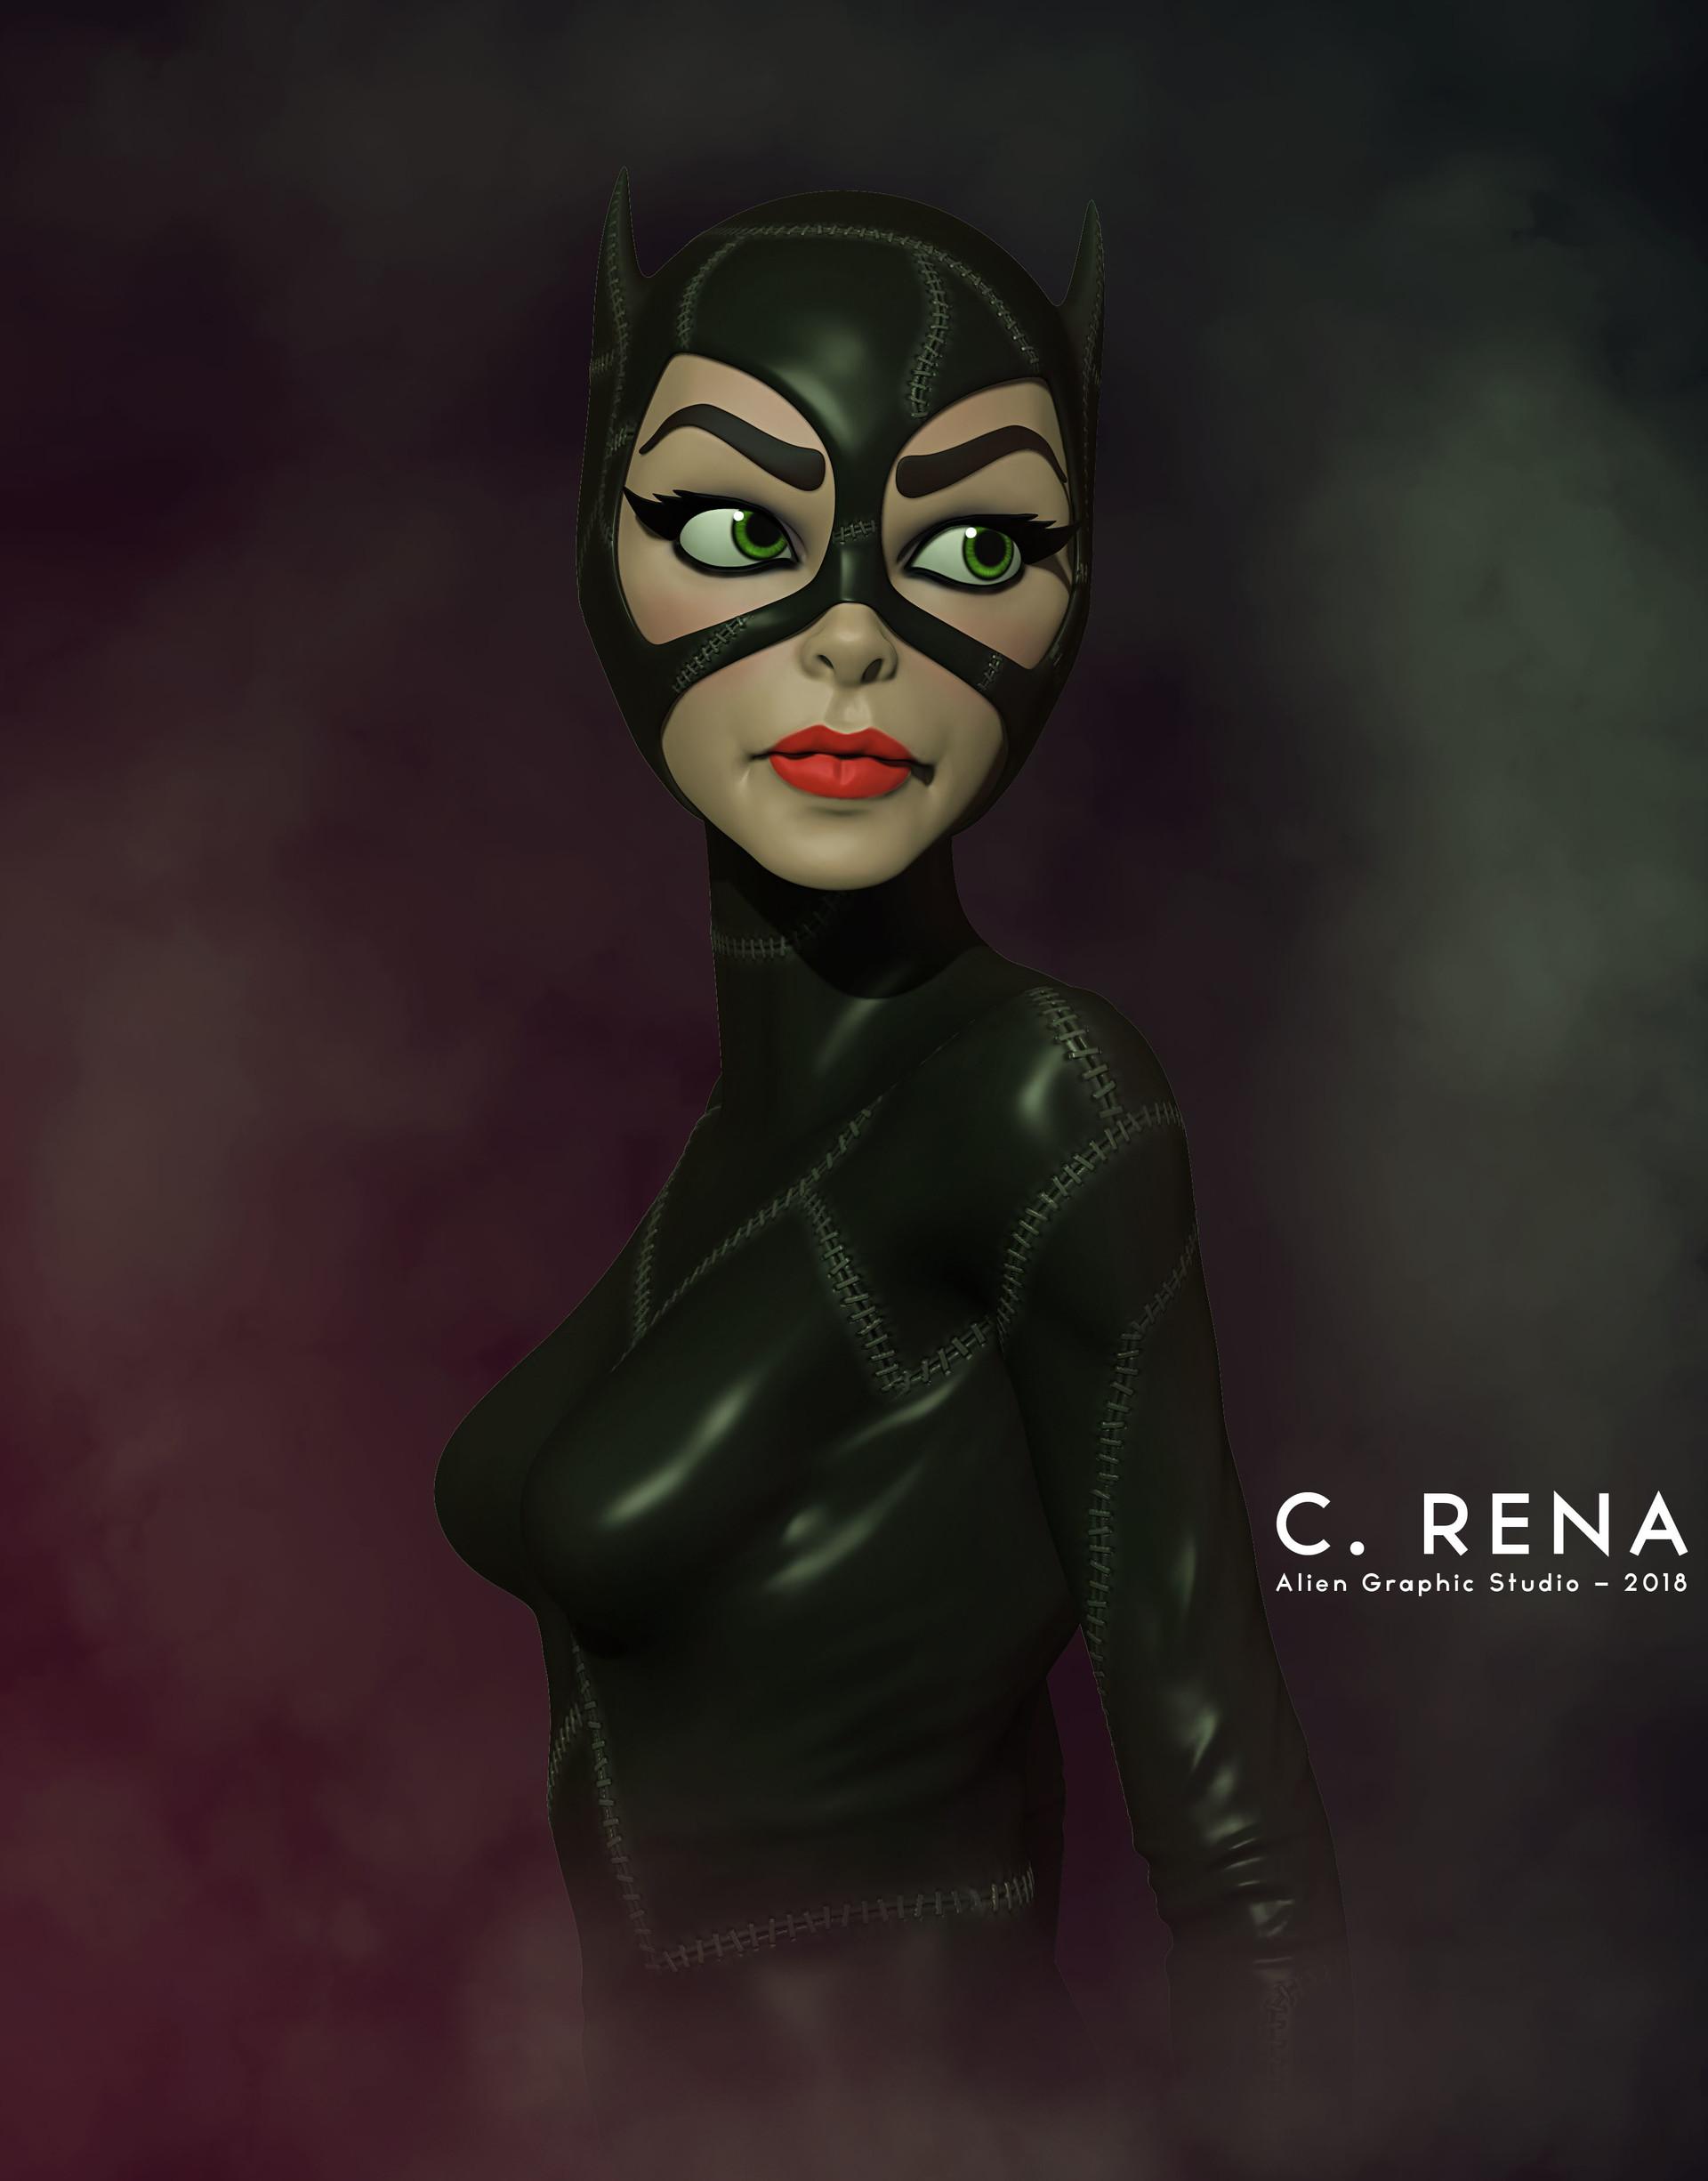 Chris rena catwoman illustration cinefilter